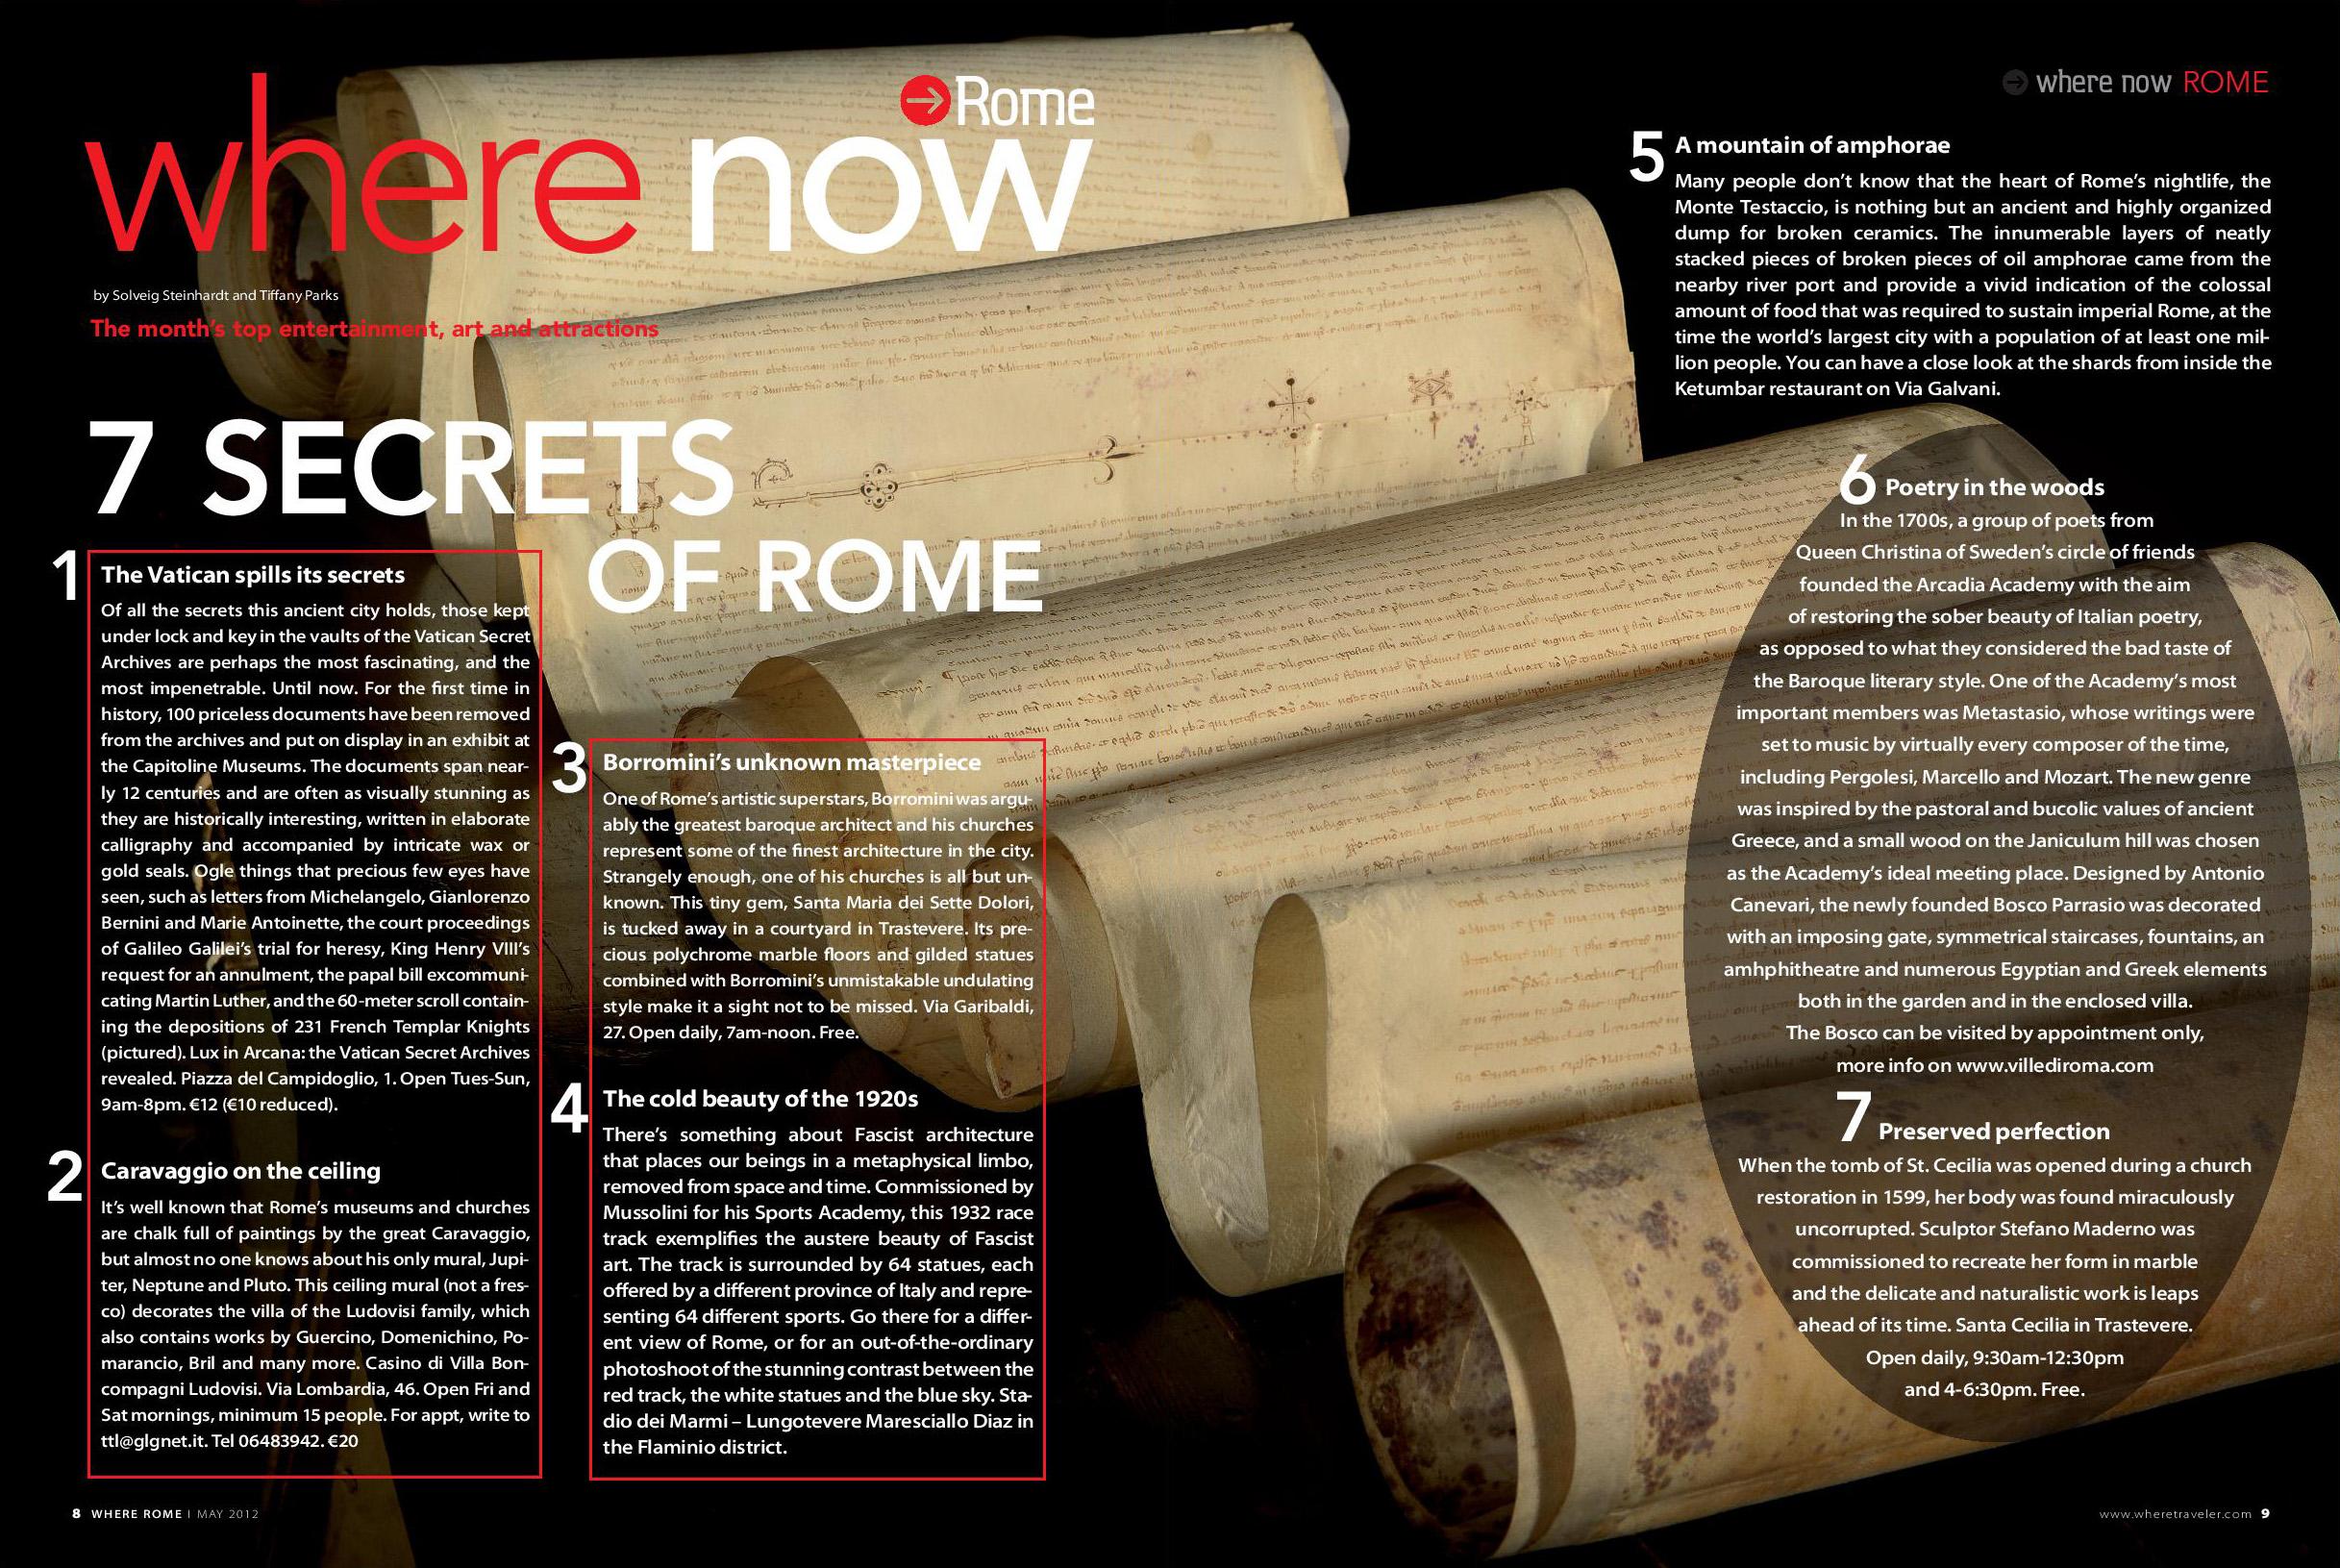 7-Secrets-of-Rome-where-Rome-may-2012.jpg